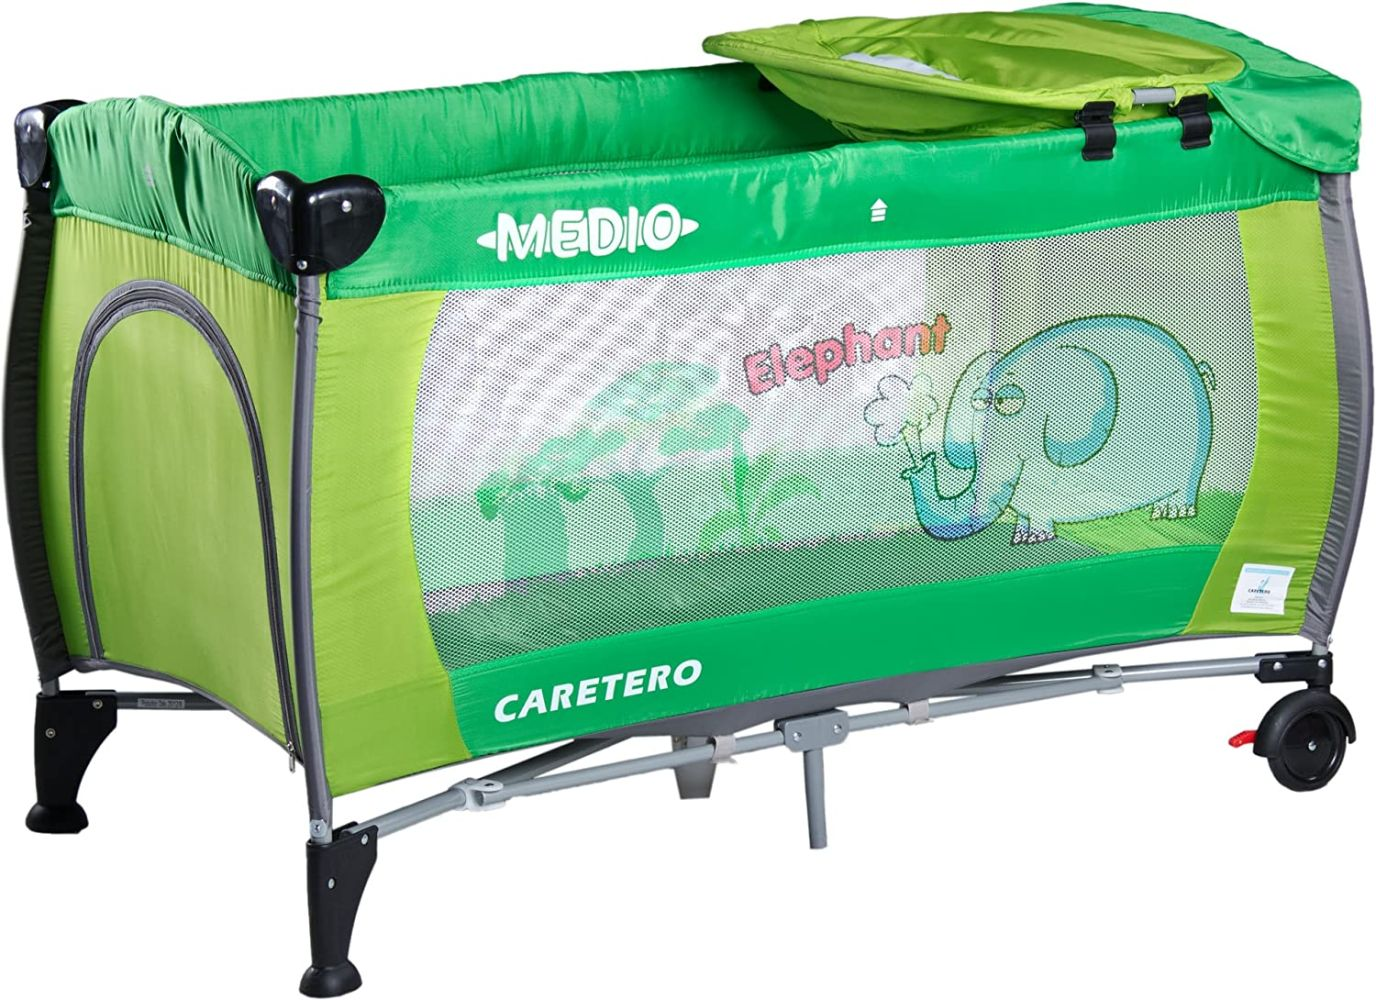 Caretero Medio Safari, Reisebett, grün Bild 1